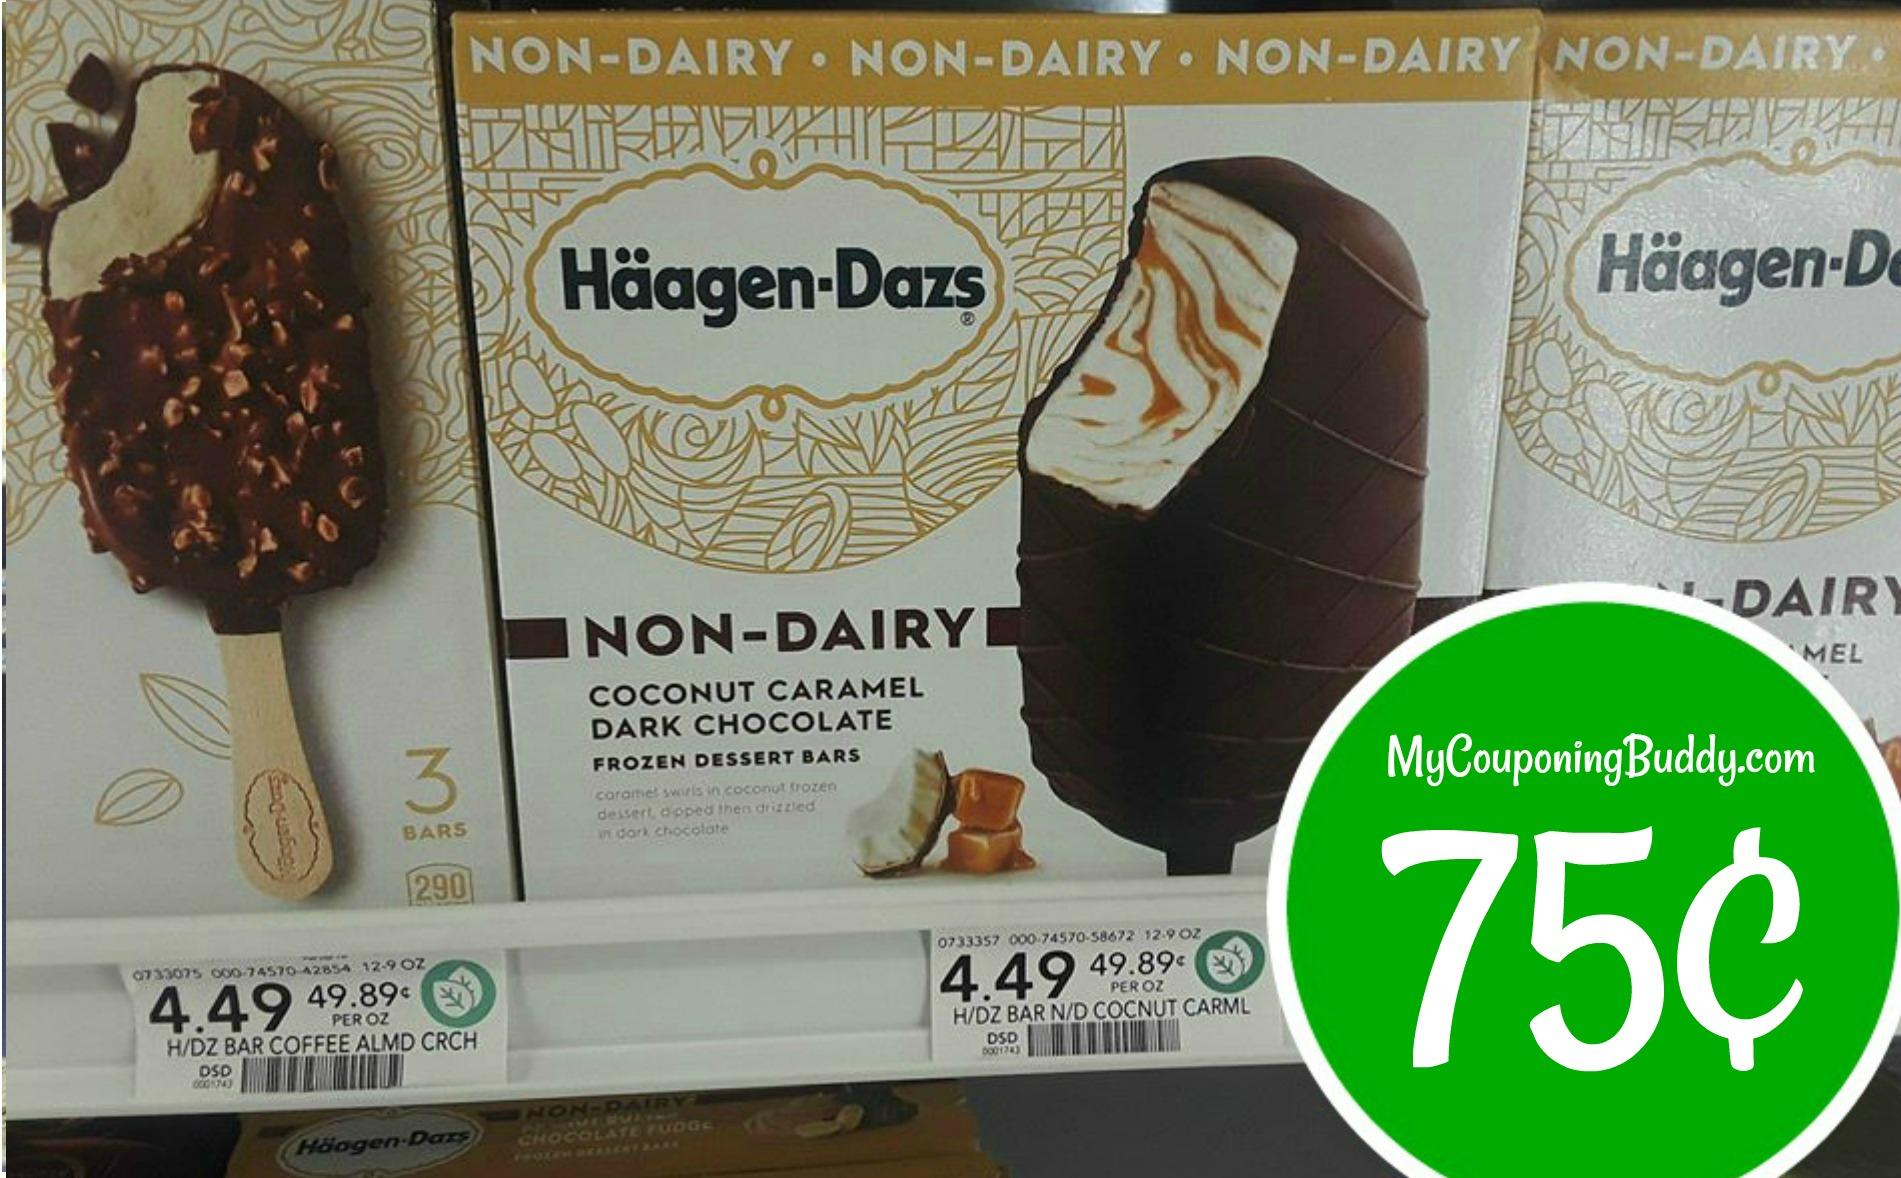 photo regarding Haagen Dazs Printable Coupon called Haagen-Dazs Ice Product 75¢ at Publix My Publix Coupon Pal